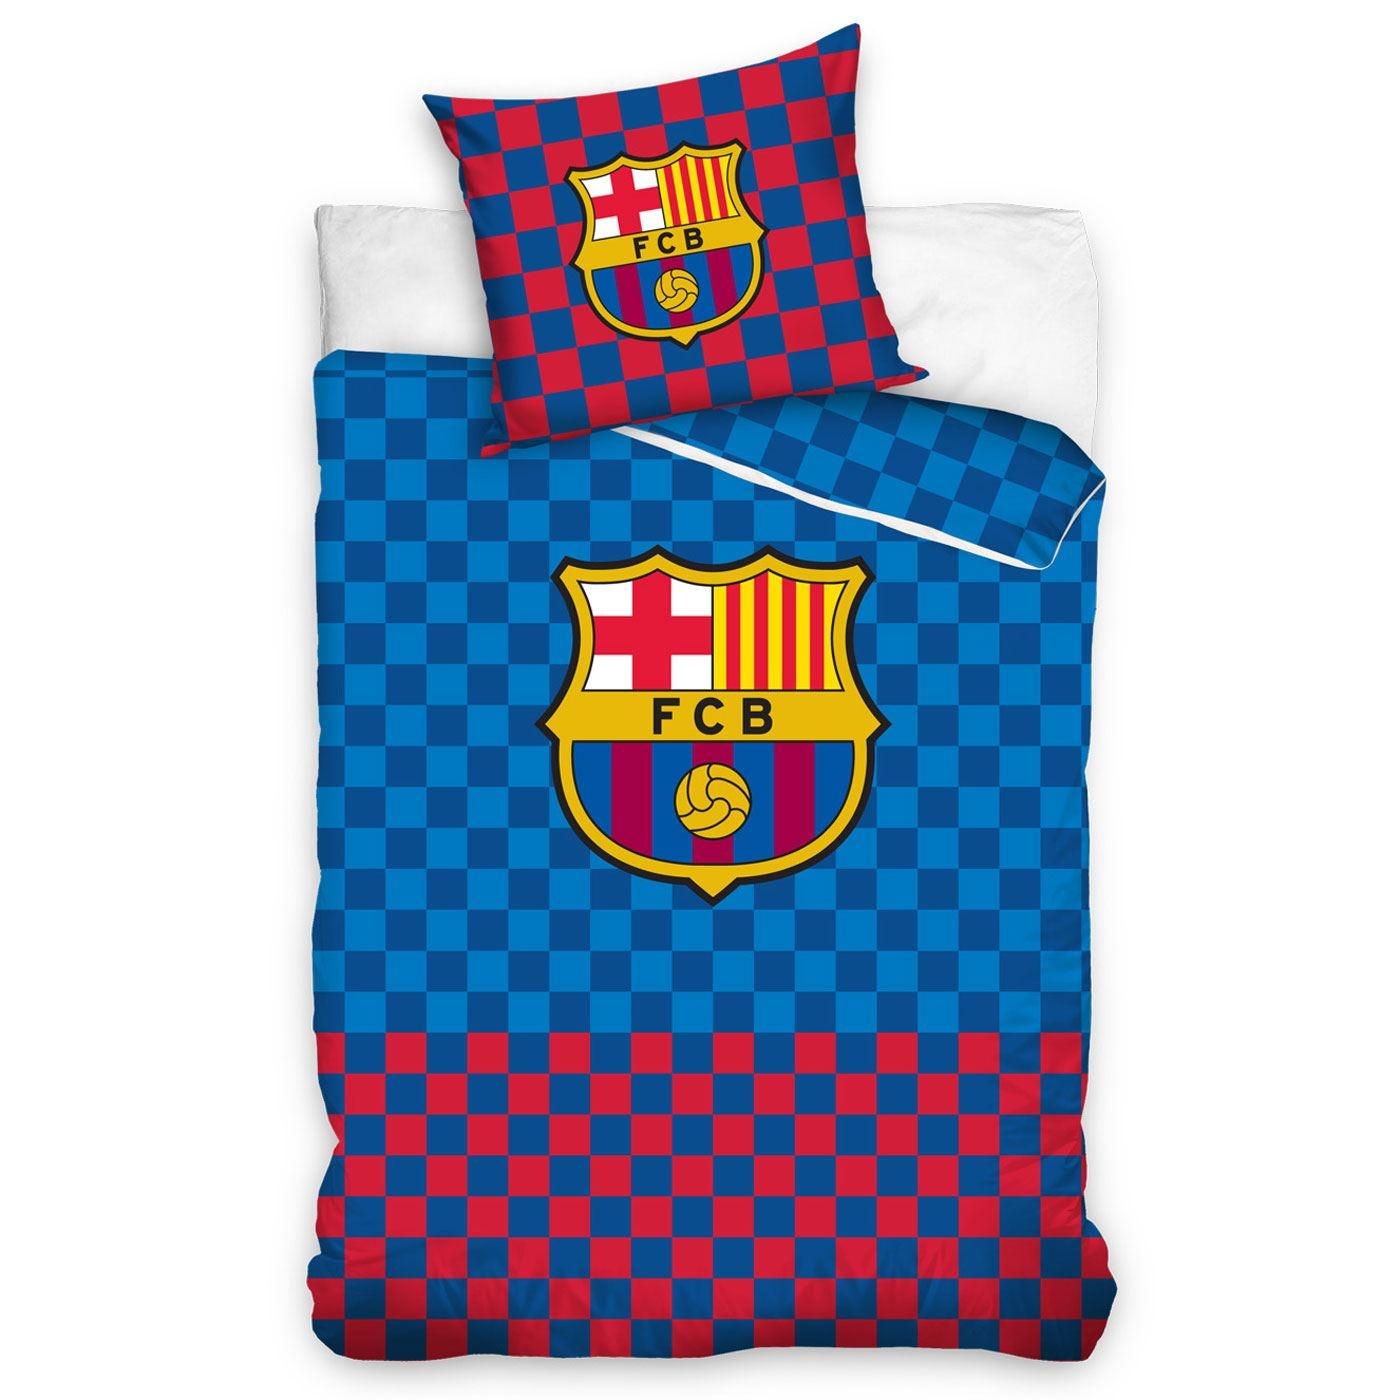 FC Barcelona FC Barcelona Dekbedovertrek Geruit